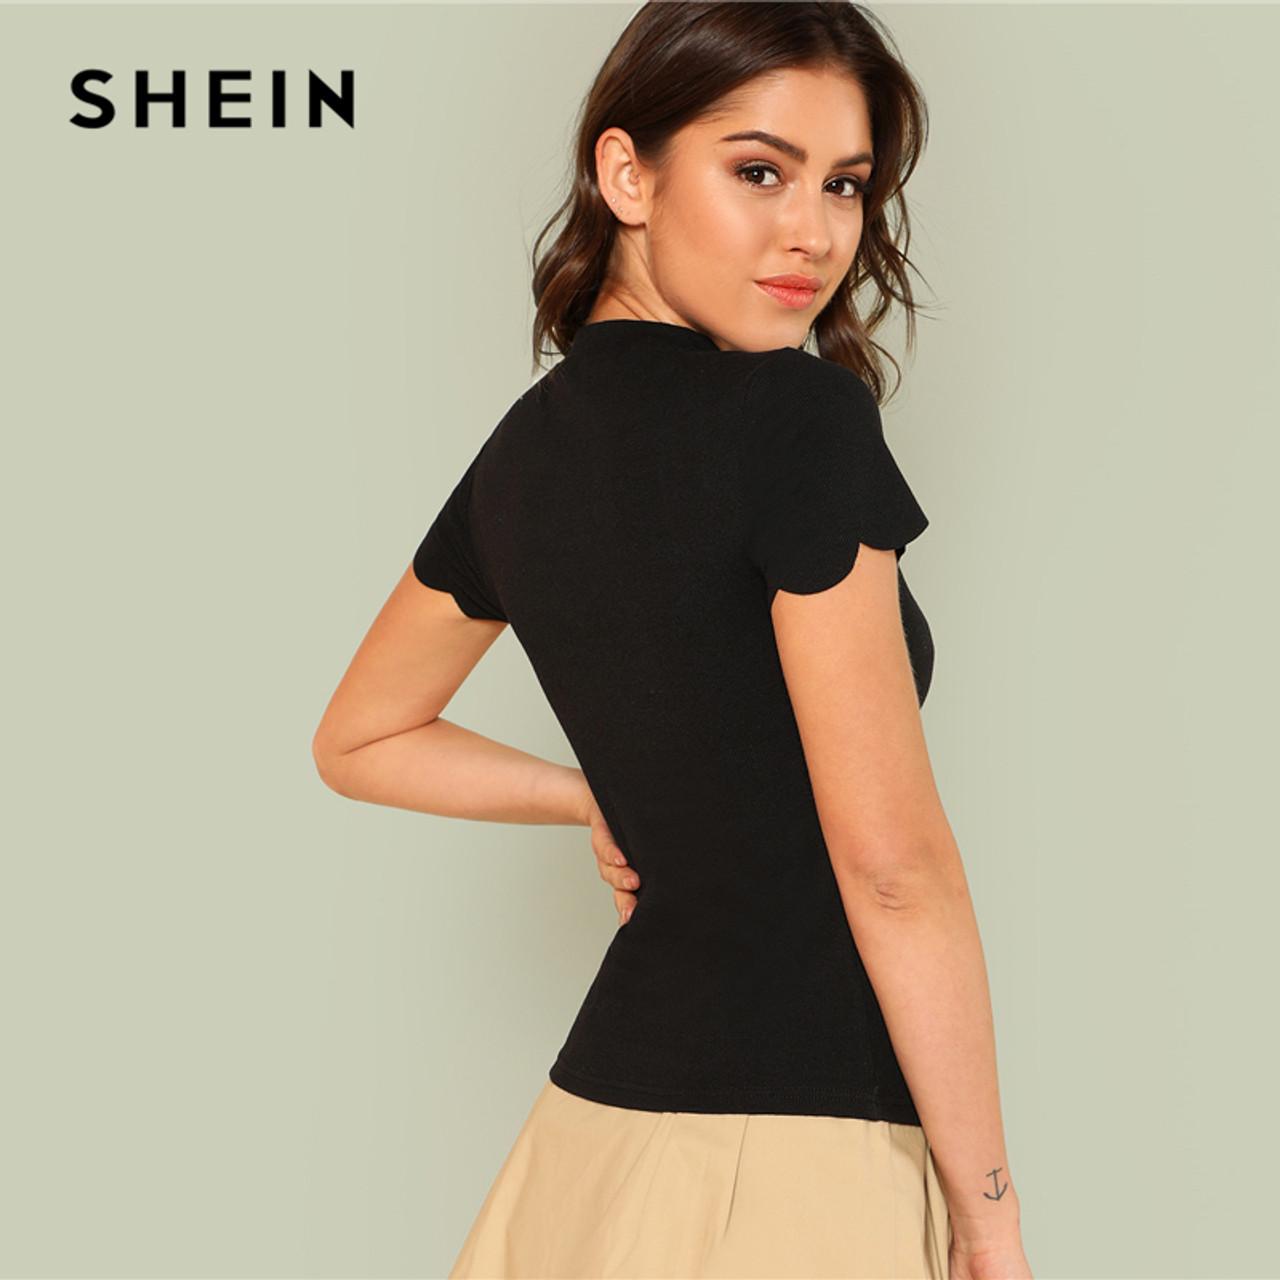 279fd6bc87 ... SHEIN Mock Neck Scallop Trim Tee 2018 Summer Fashion Short Sleeve V Neck  Lace Top Women ...